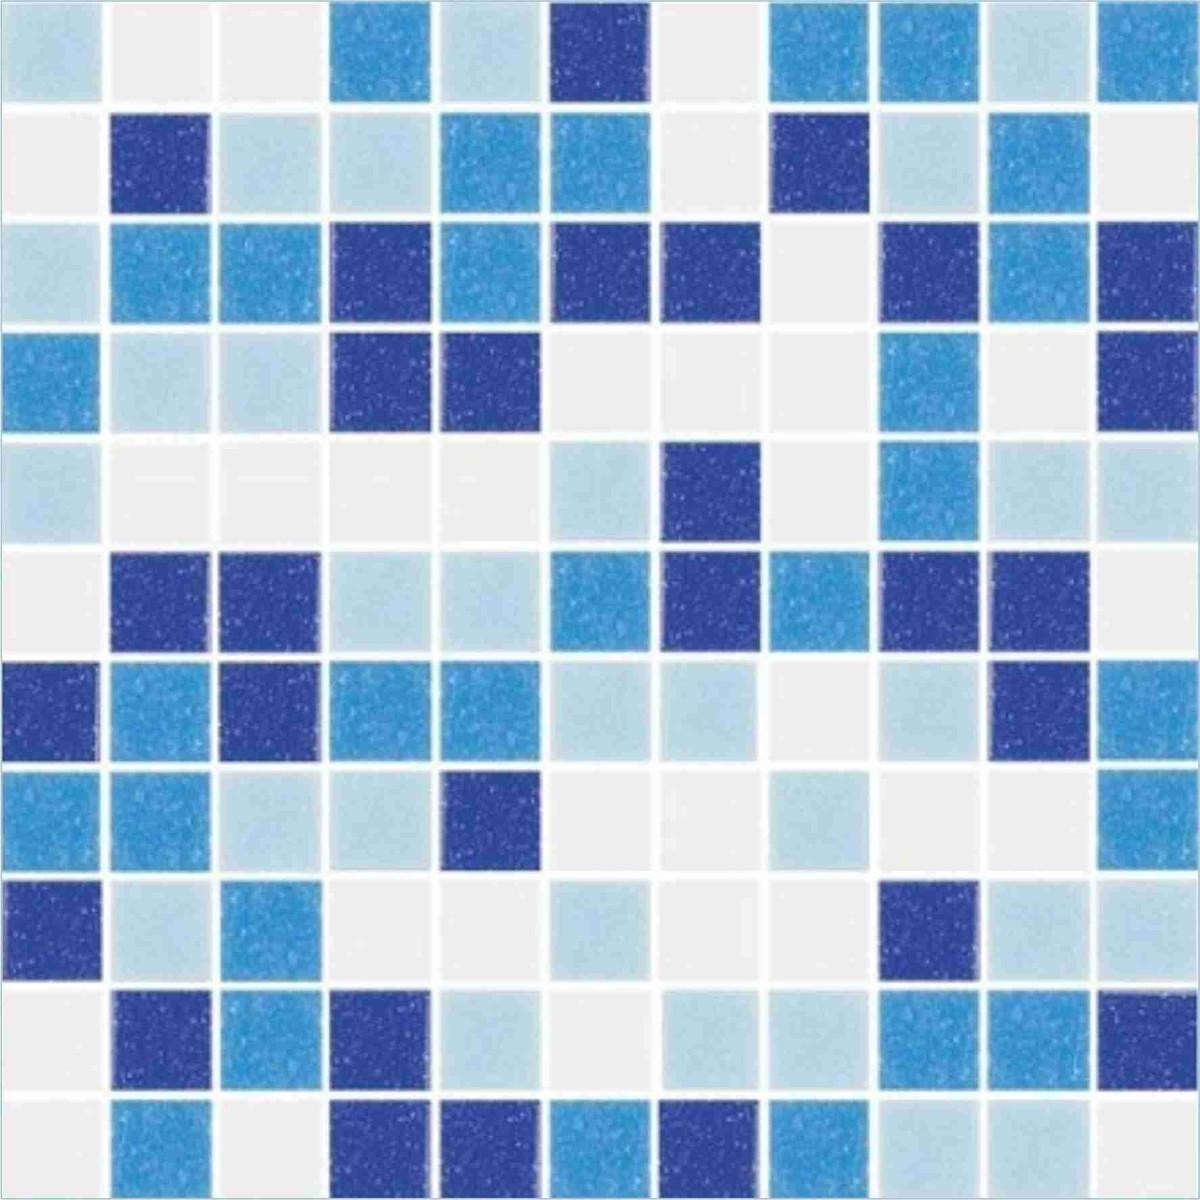 kit pastilhas azul bco frete gratis banheiro kit pastilhas azul bco  #1B76B0 1200x1200 Banheiro Com Pastilha Azul E Branco